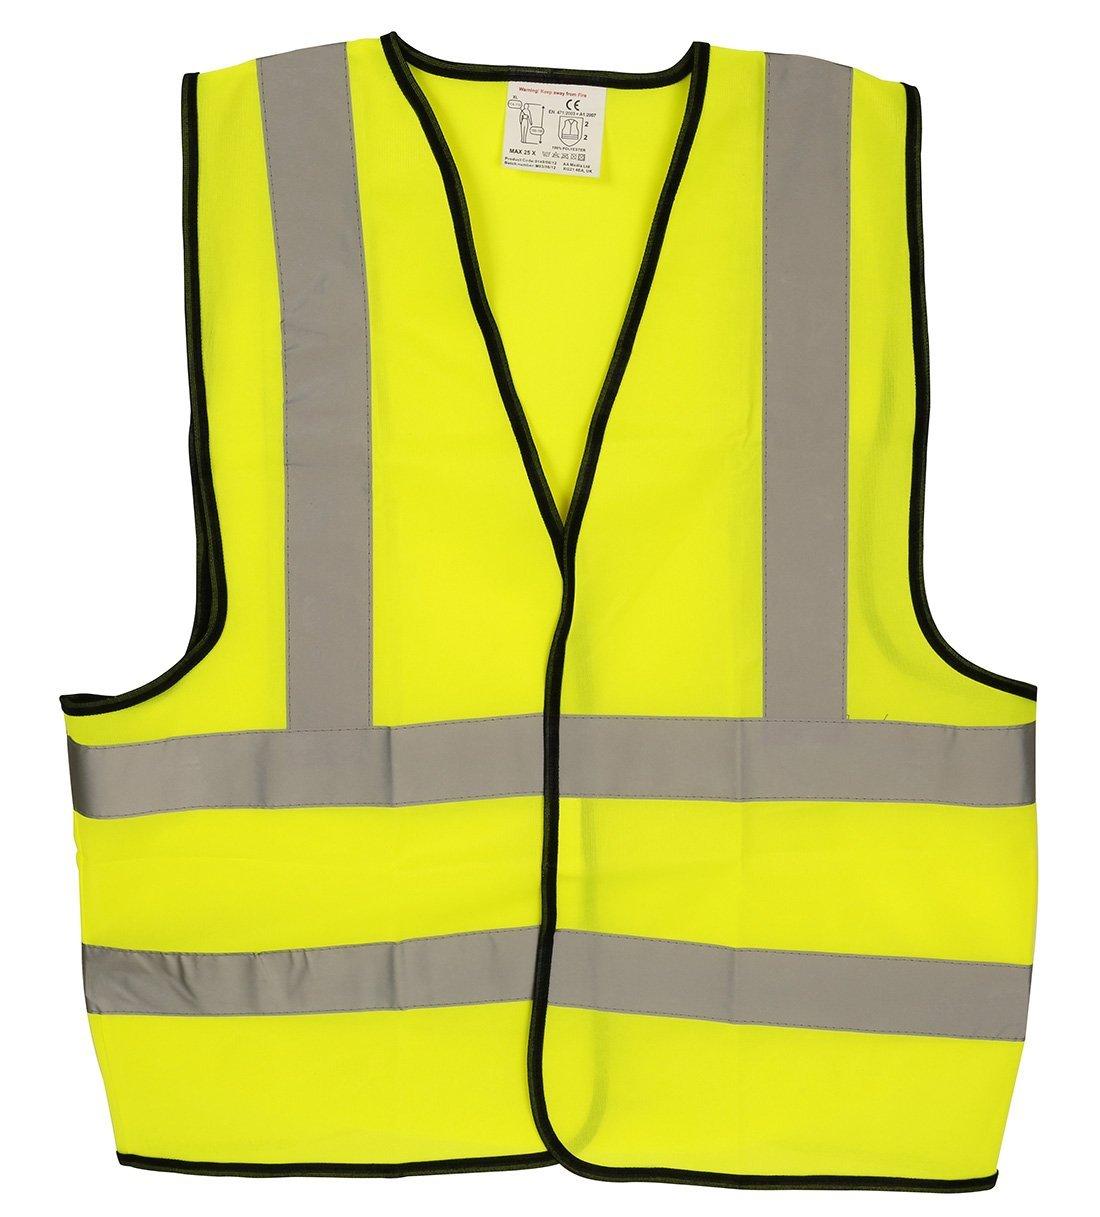 Reflective jacket or waistcoat